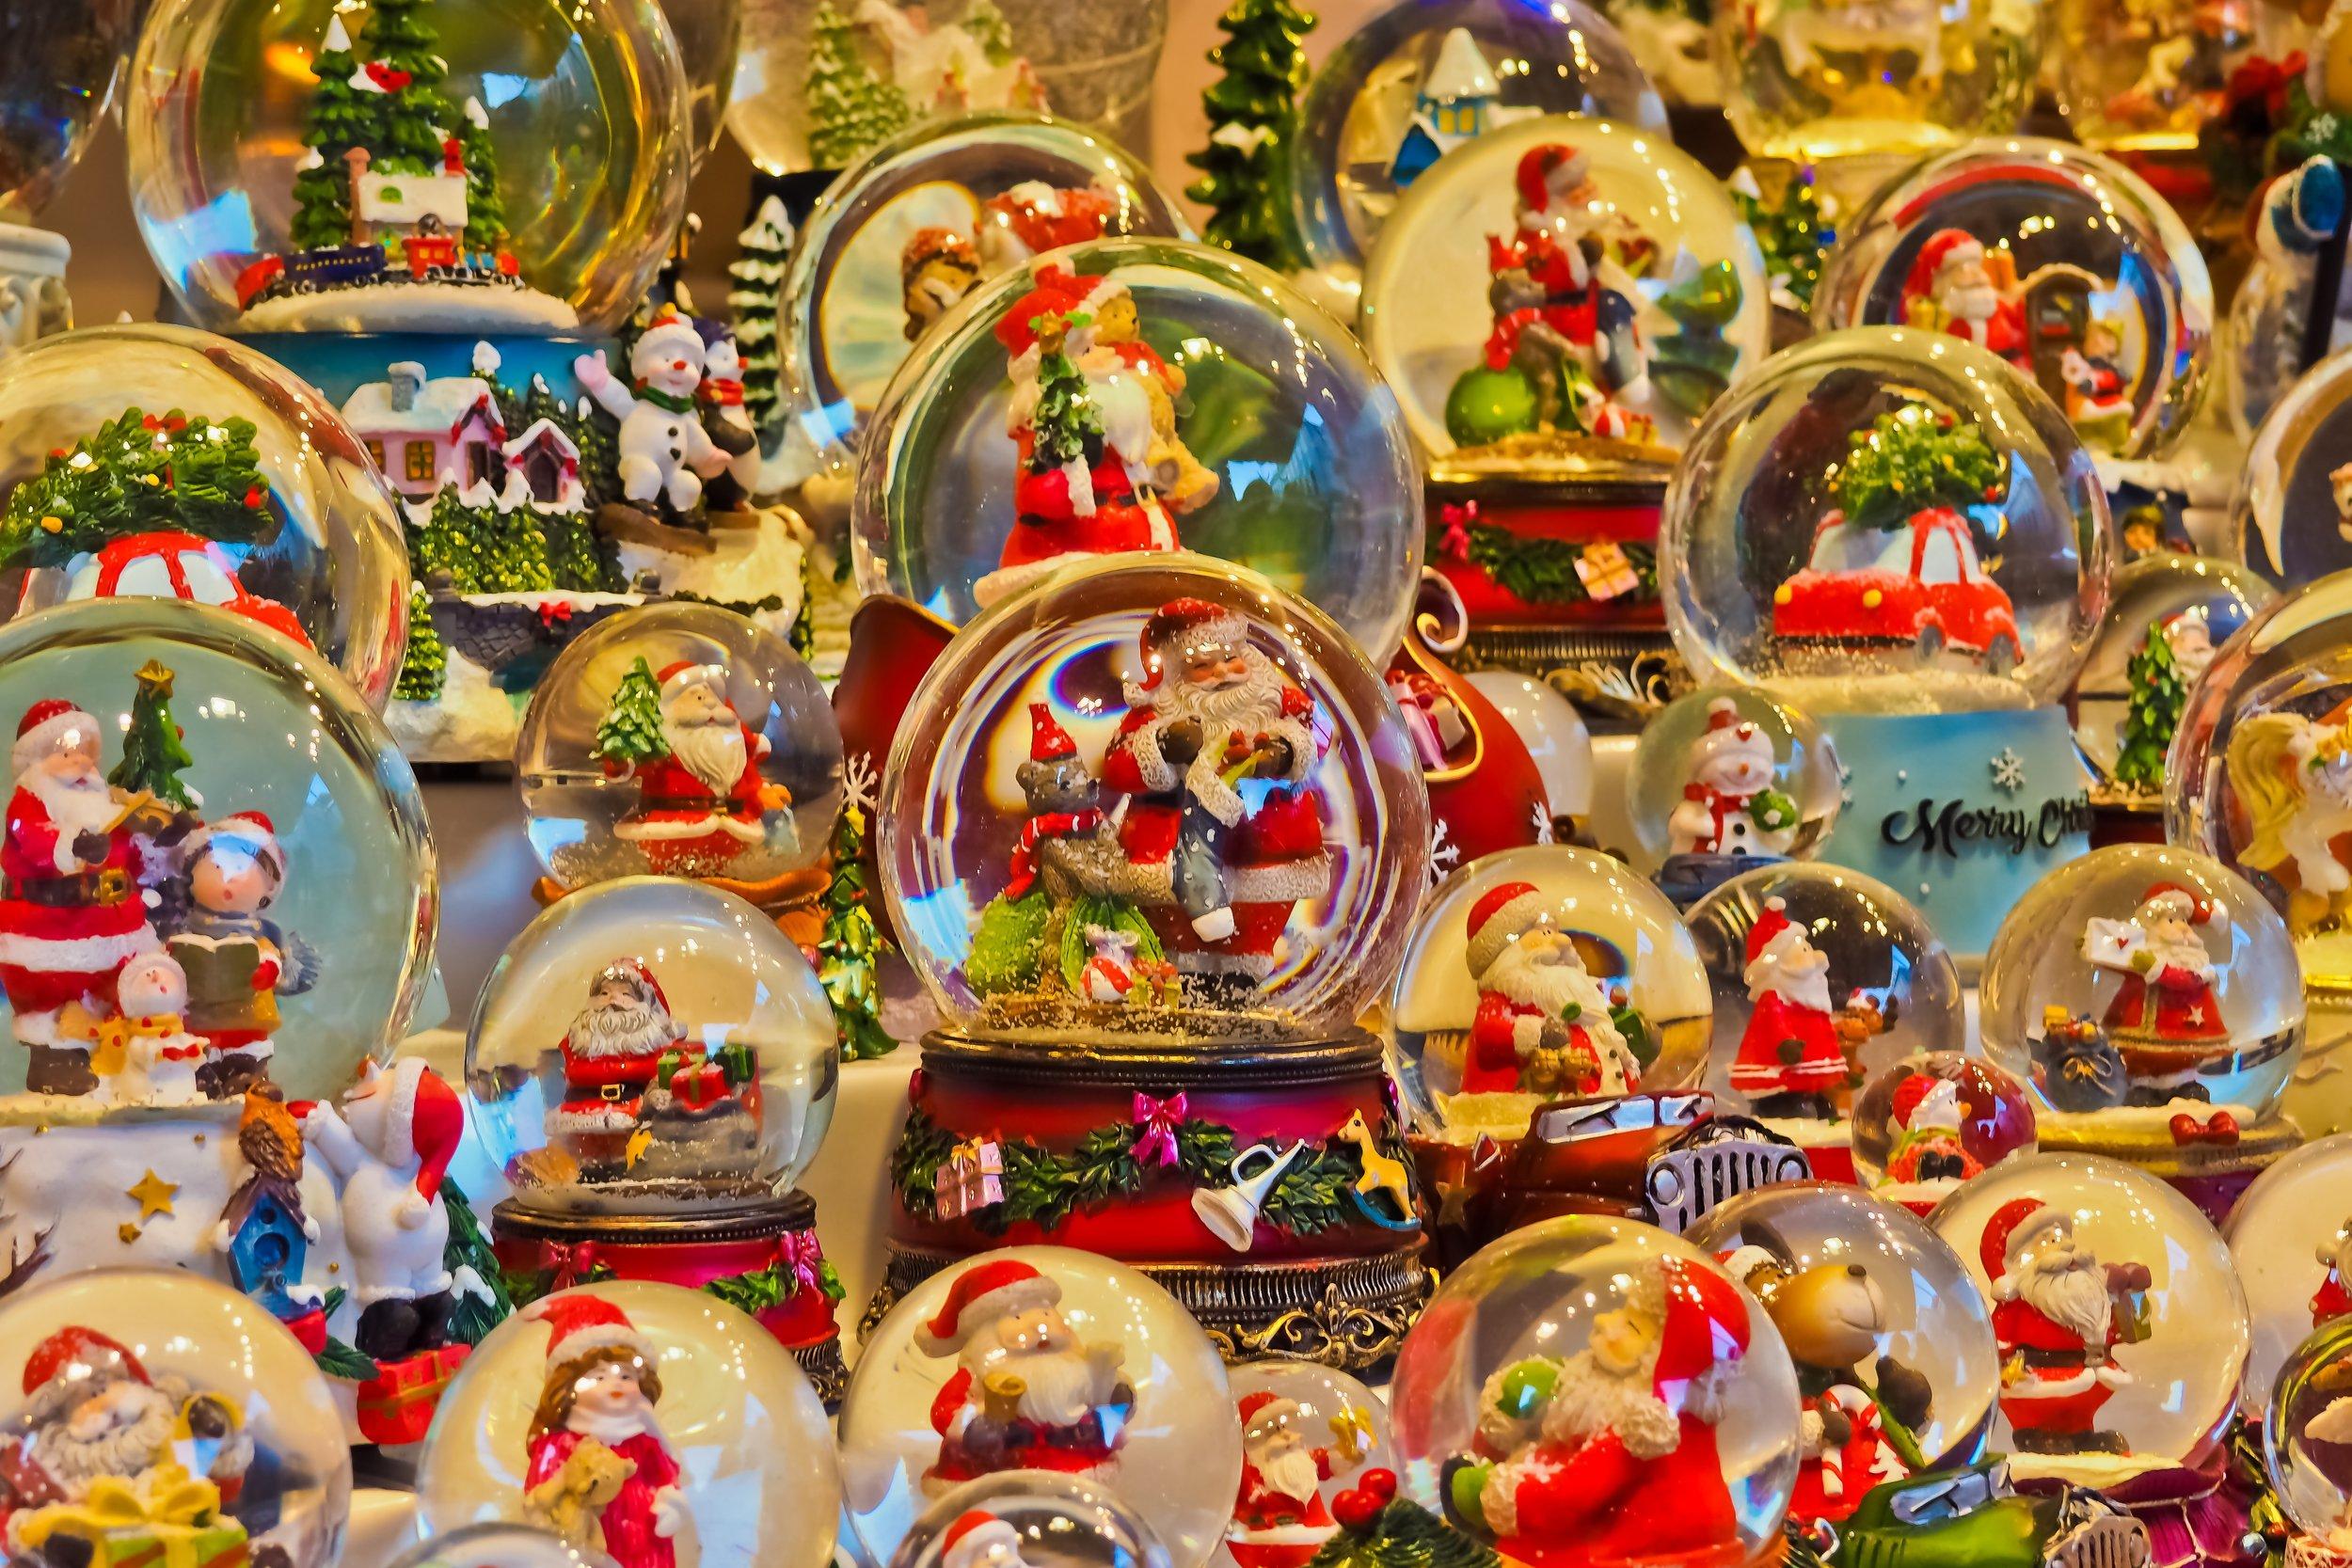 snow-balls-3882384.jpg